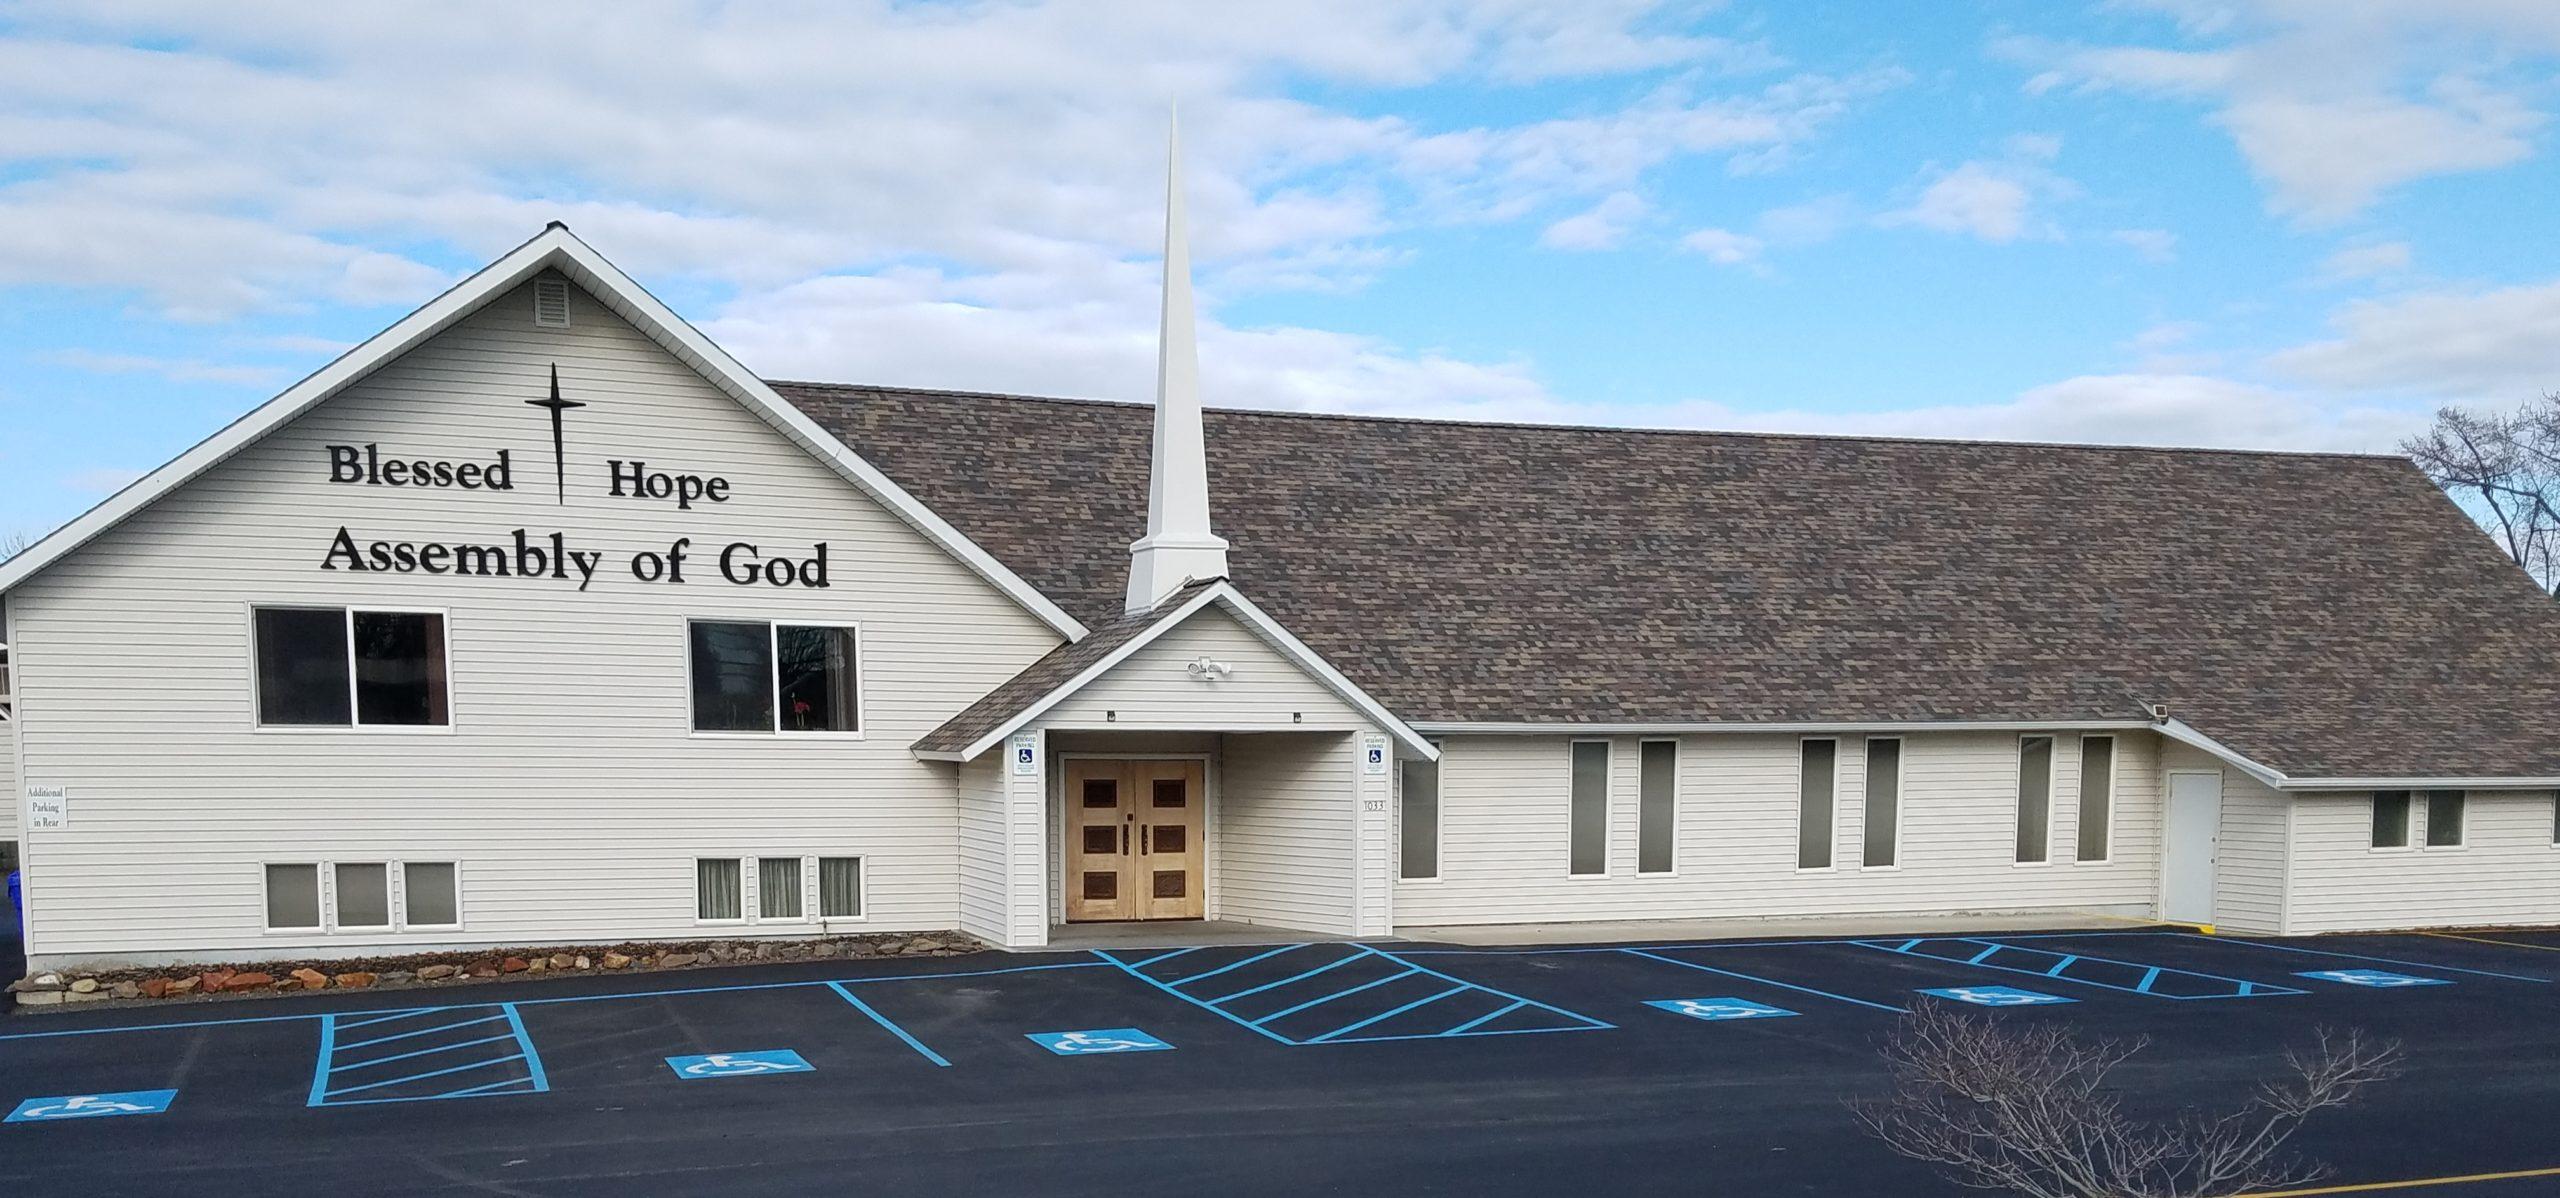 Blessed Hope Assembly of God